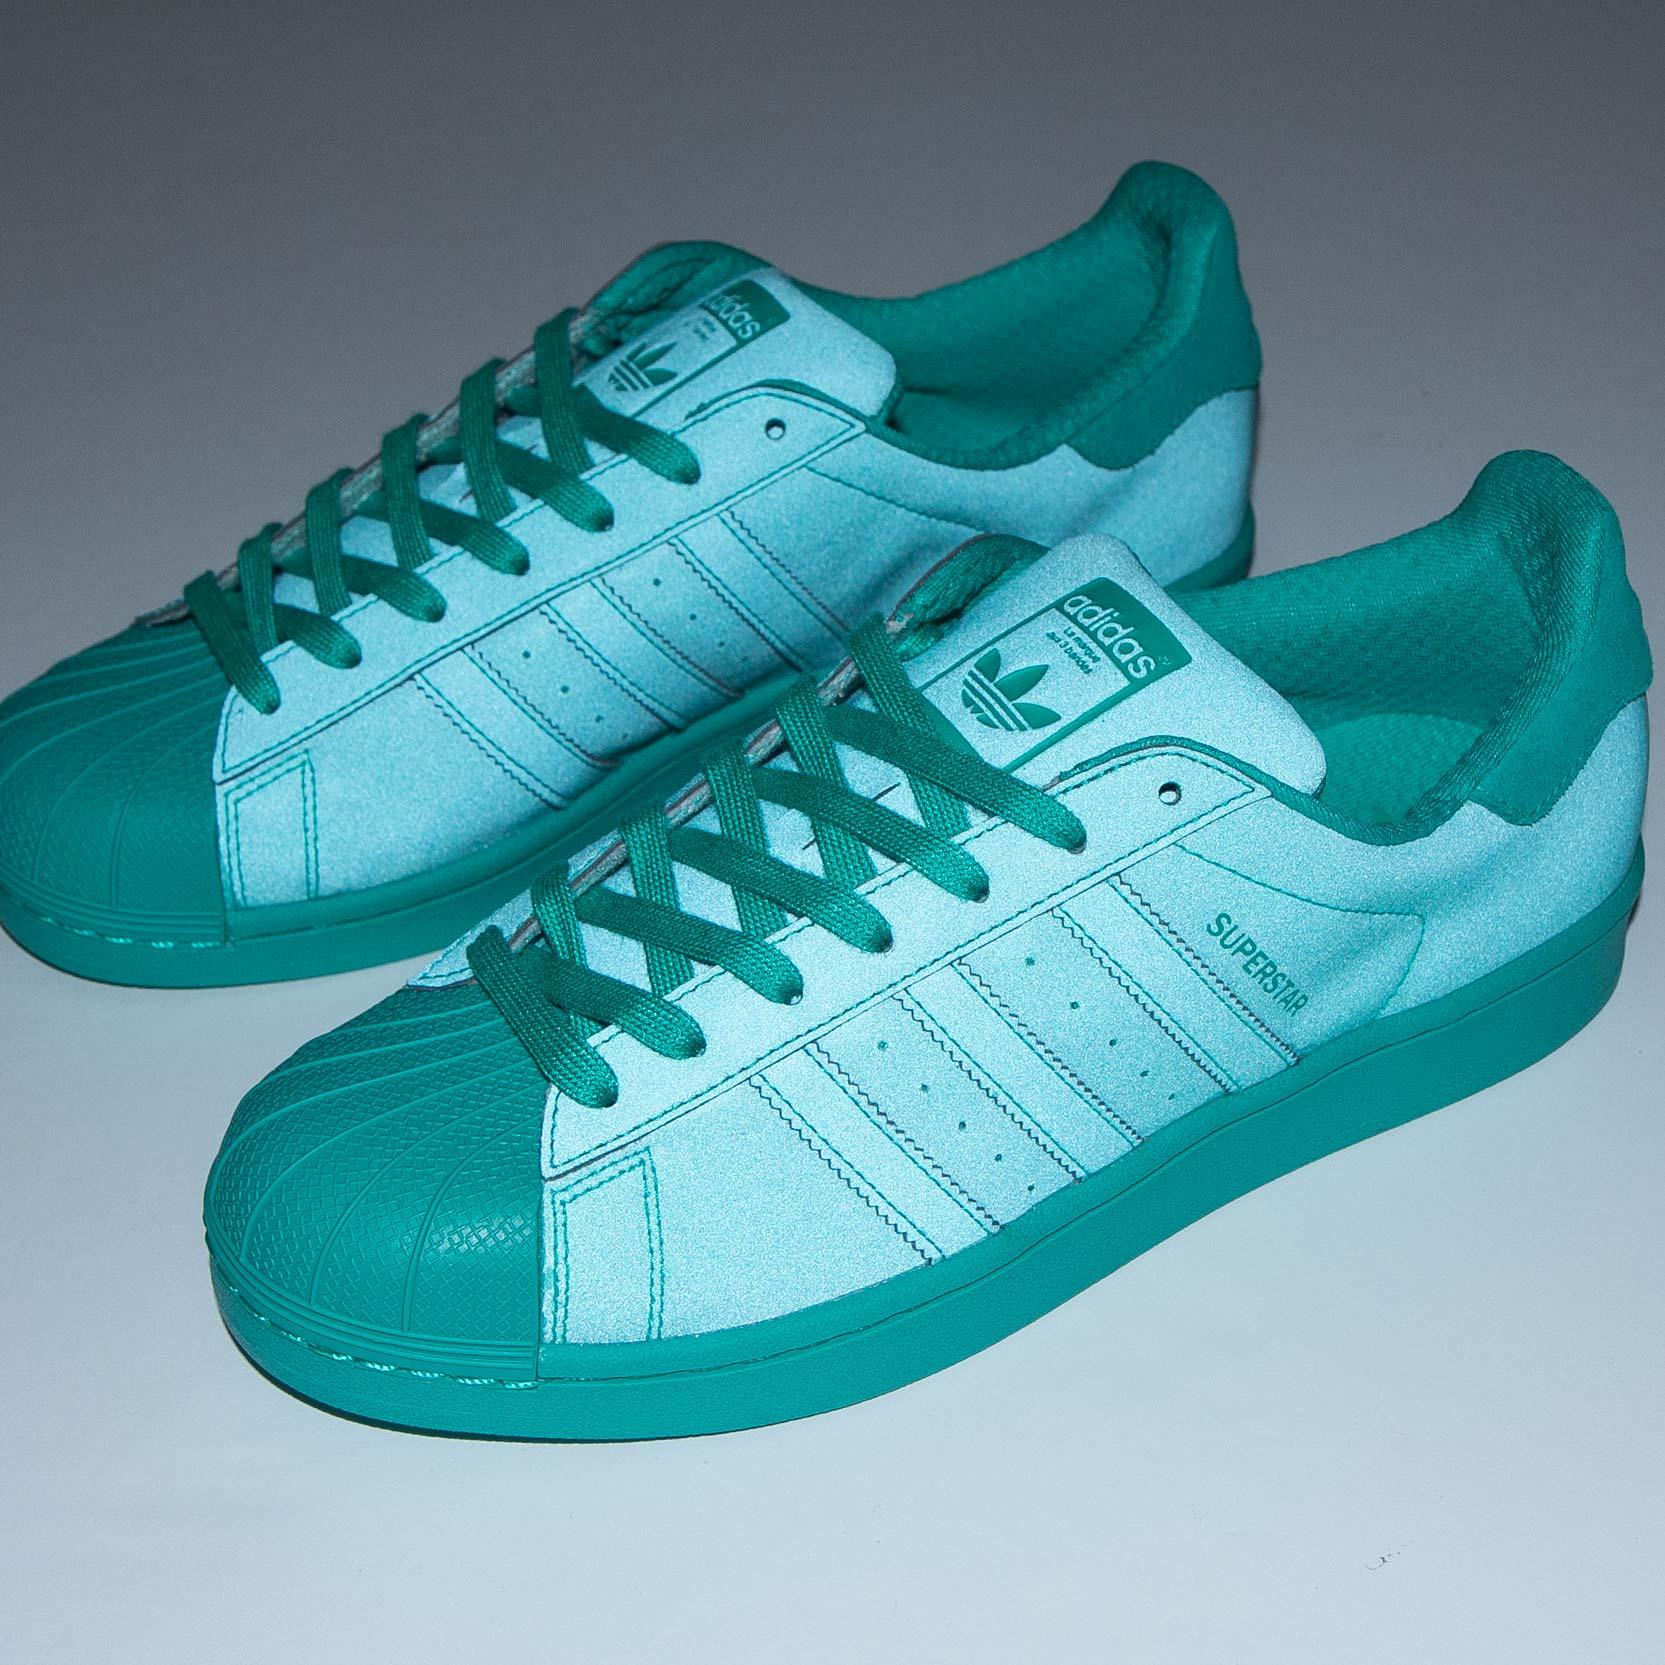 adidas Superstar Adicolor - S80331 - Sneakersnstuff